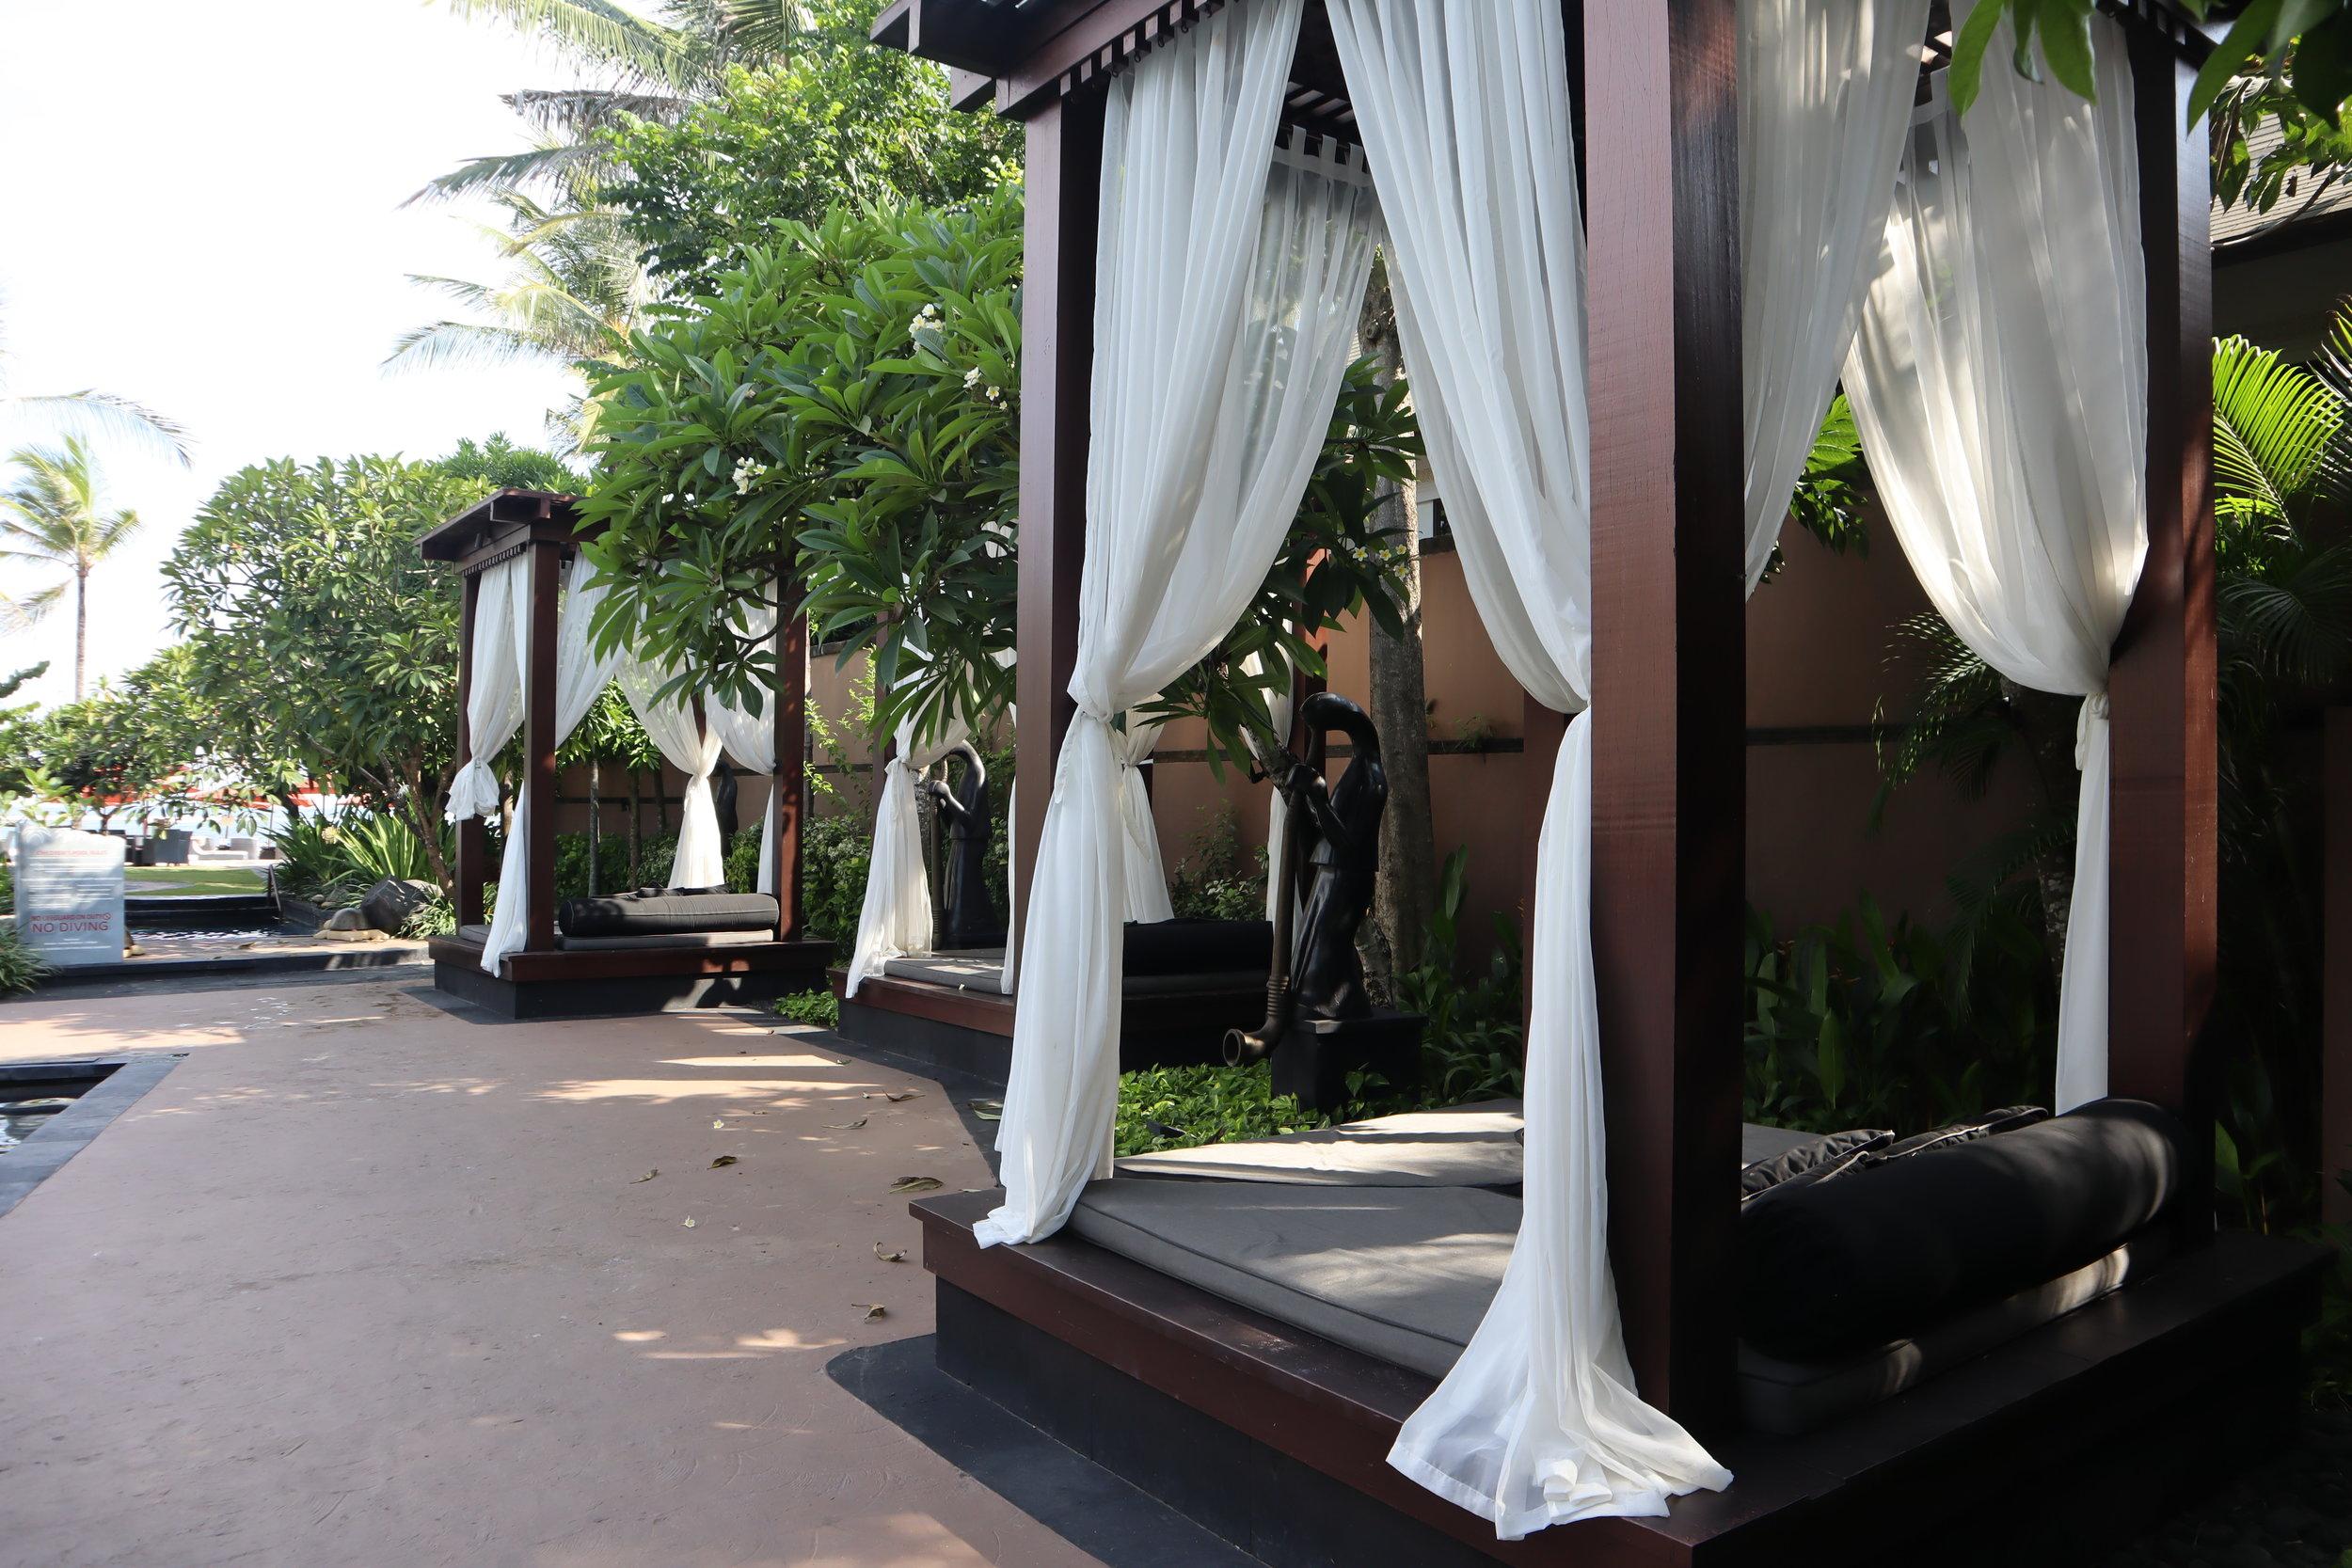 St. Regis Bali – Poolside cabanas